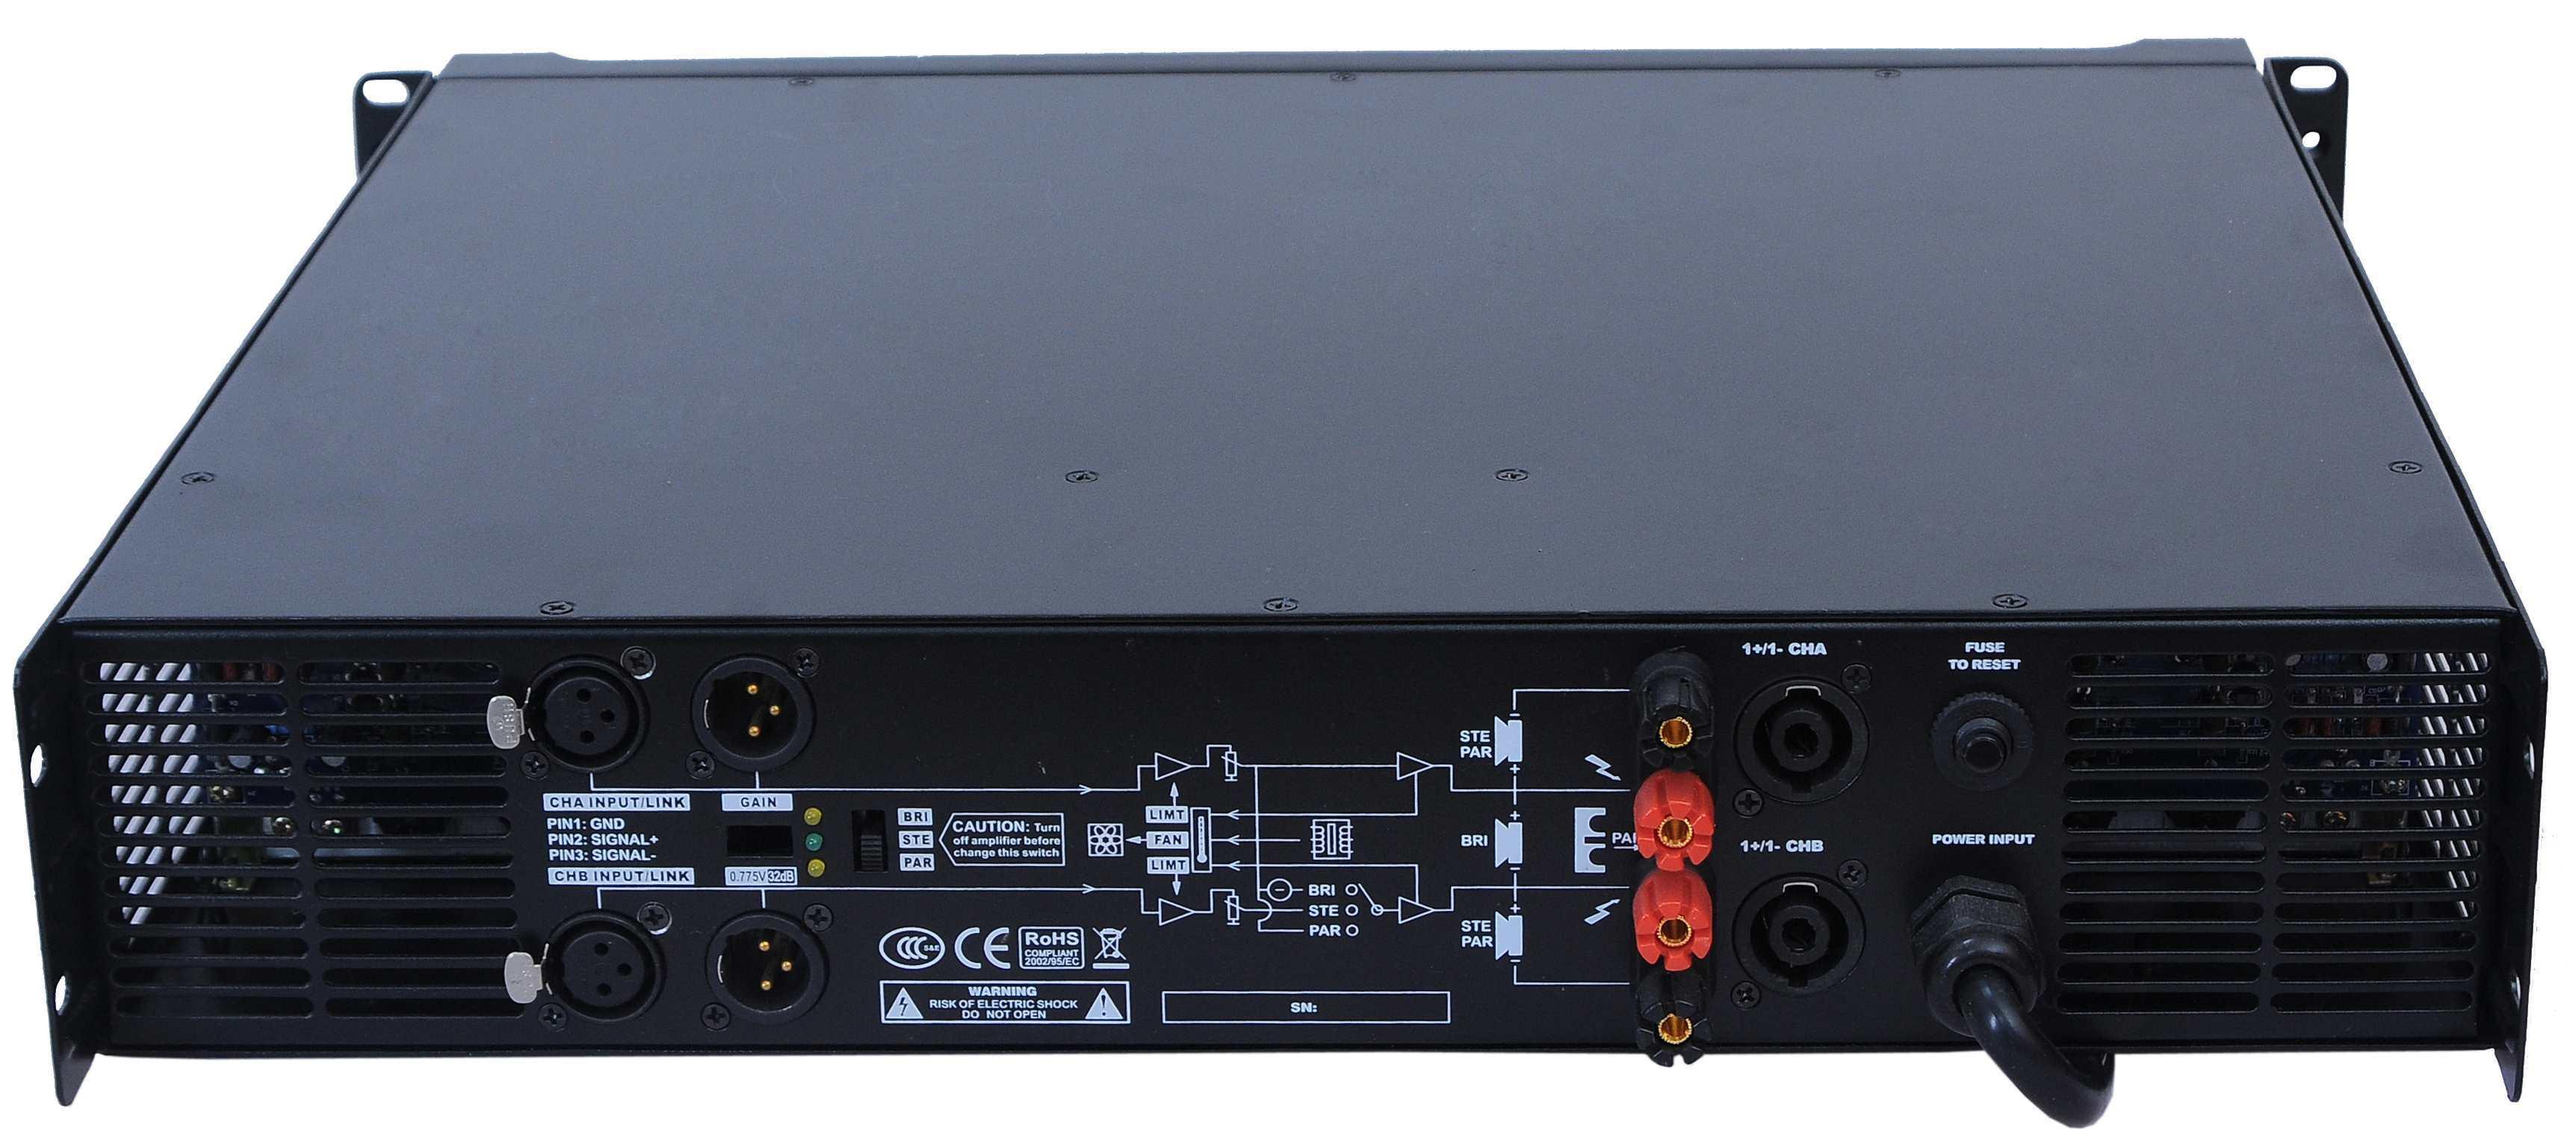 Dp Series, 2 Channels Professional Power Amplifier, 2u Standard Carbinet